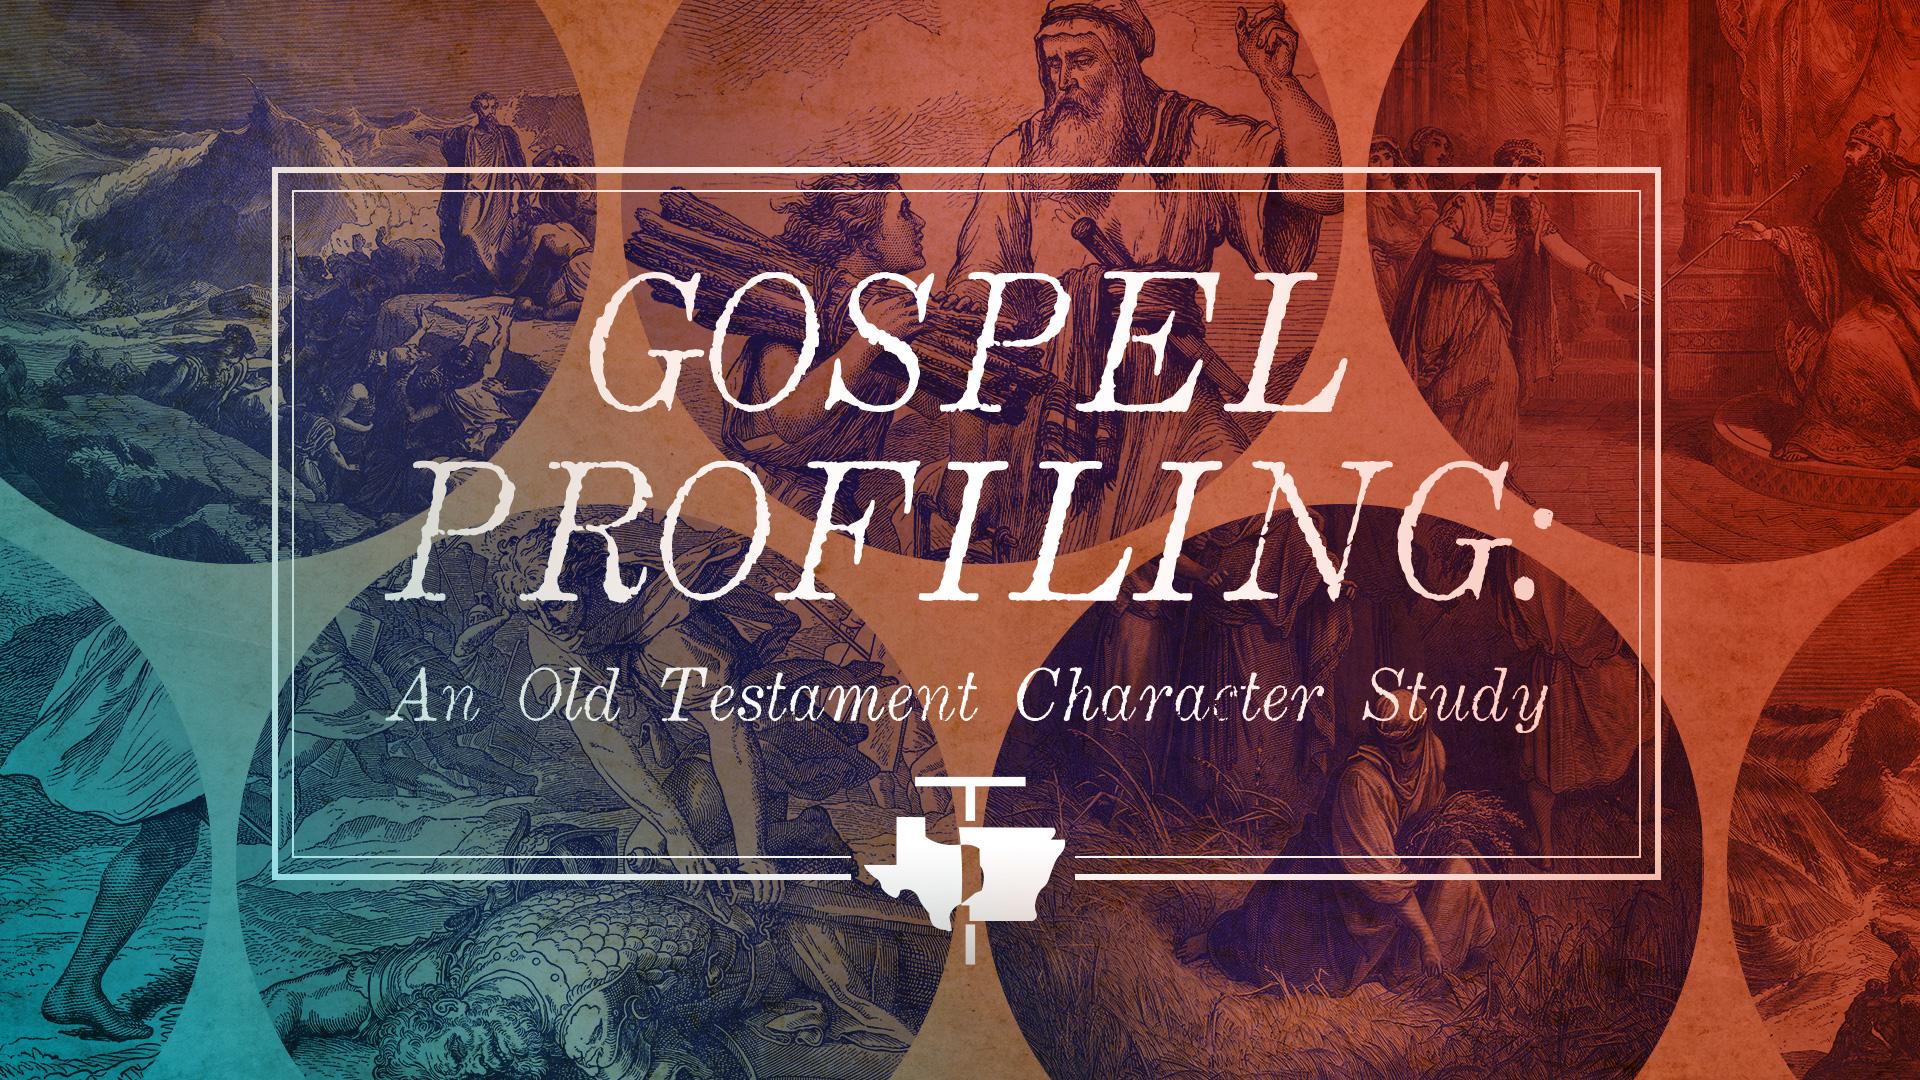 gospelprofiling.jpg